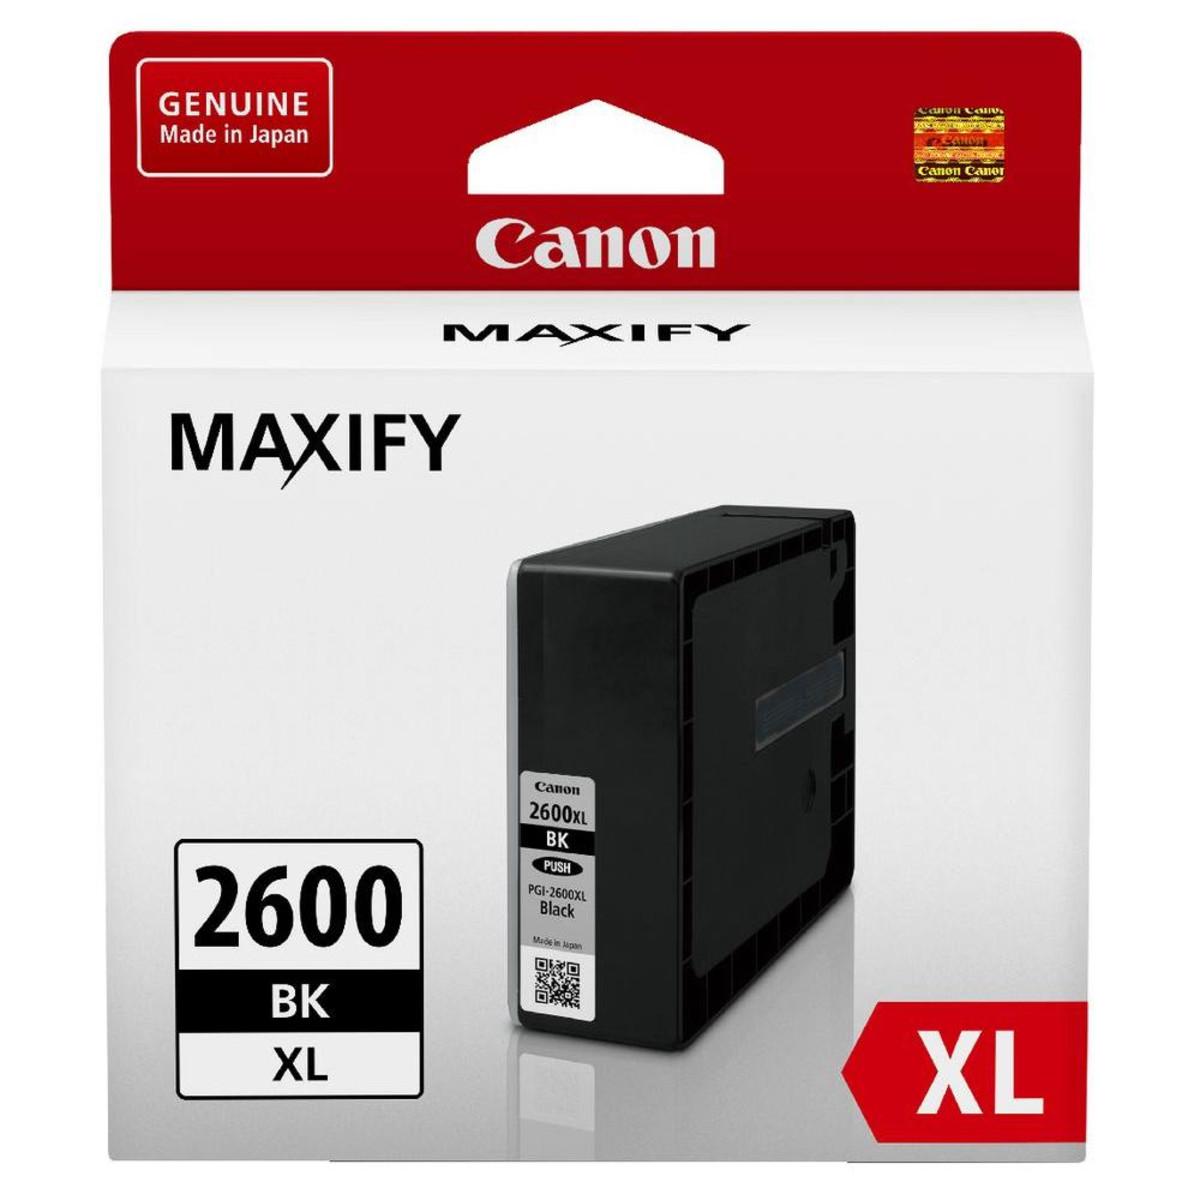 Canon PGI-2600XL Black Ink Cartridge - High Yield